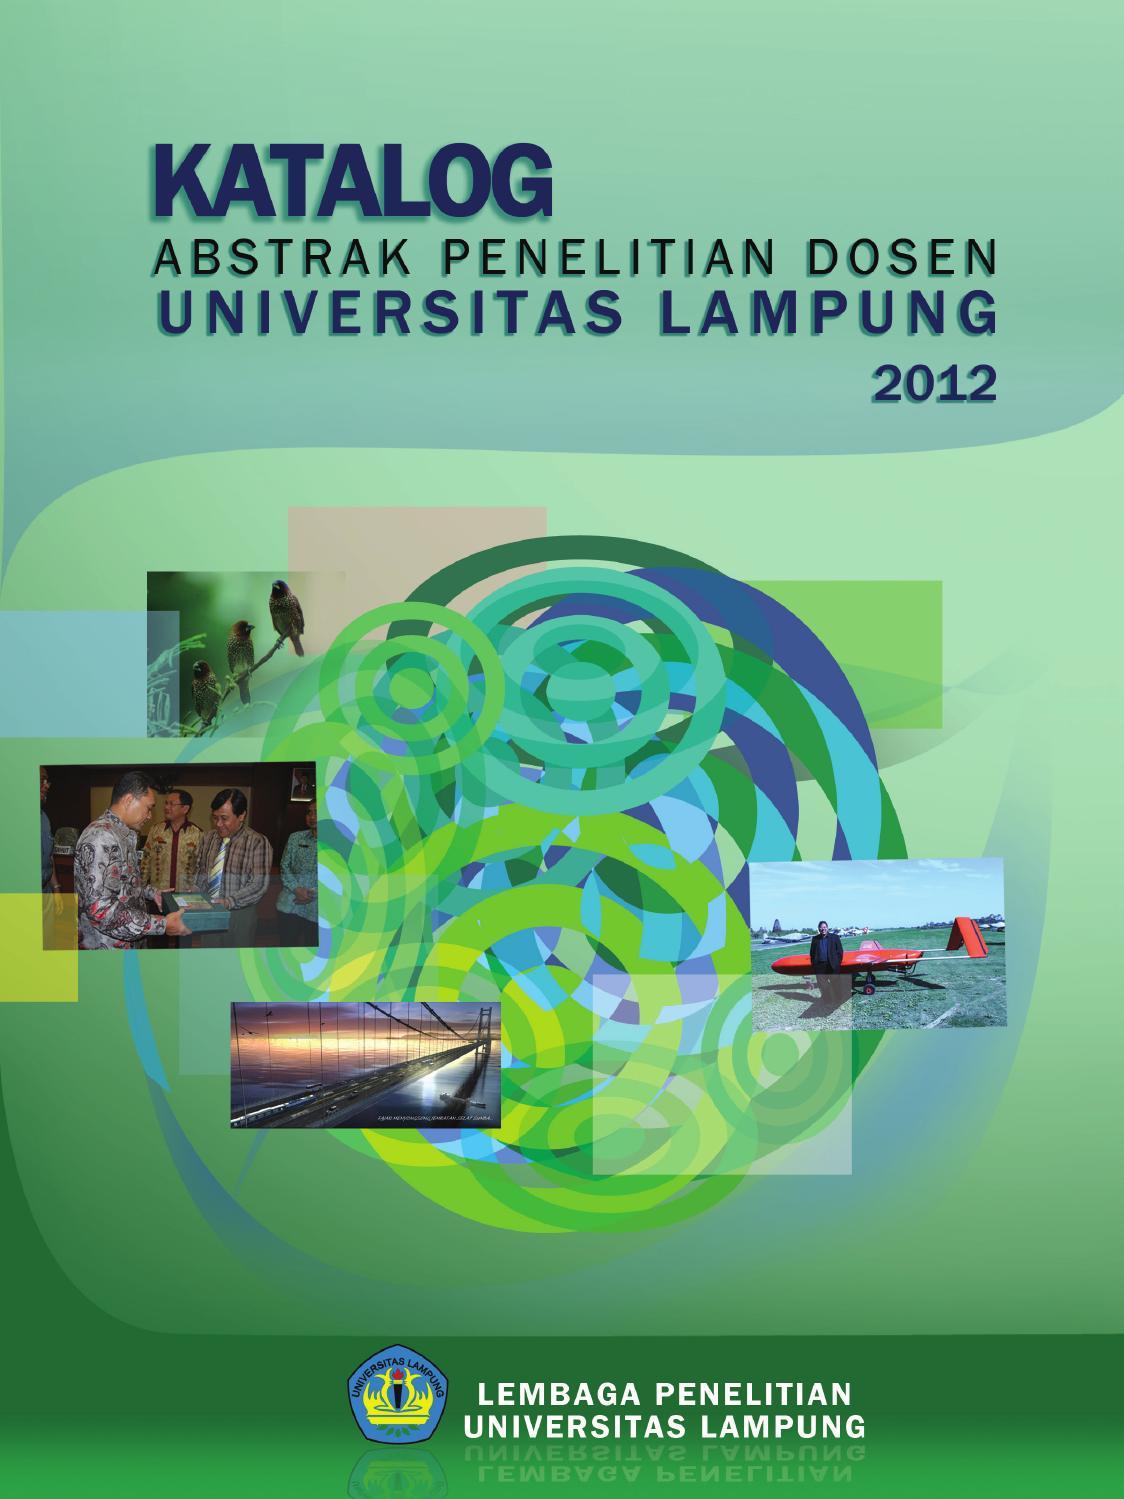 Katalog Abstrak Penelitian Dosen Universitas Lampung 2012 By Aprohan Saputra Issuu